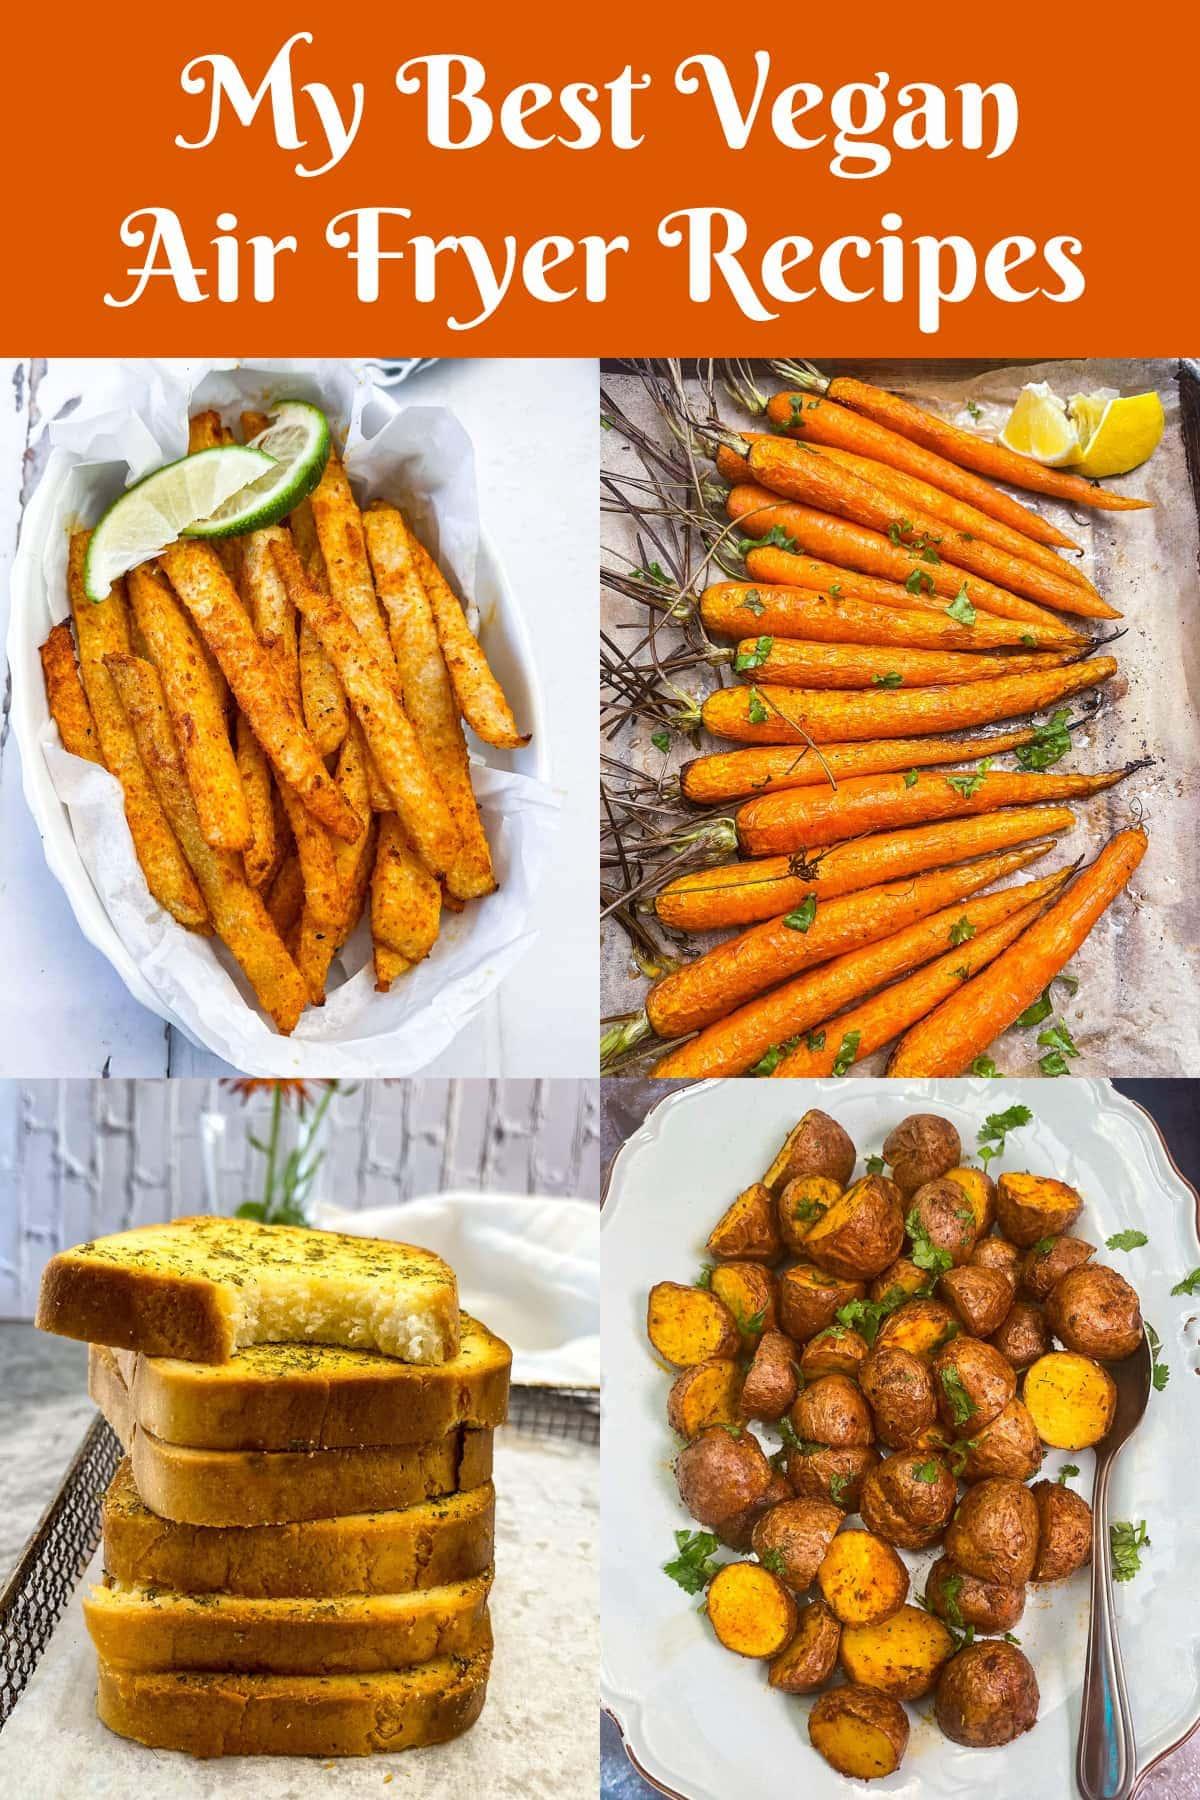 My Best Air Fryer Vegan Recipes